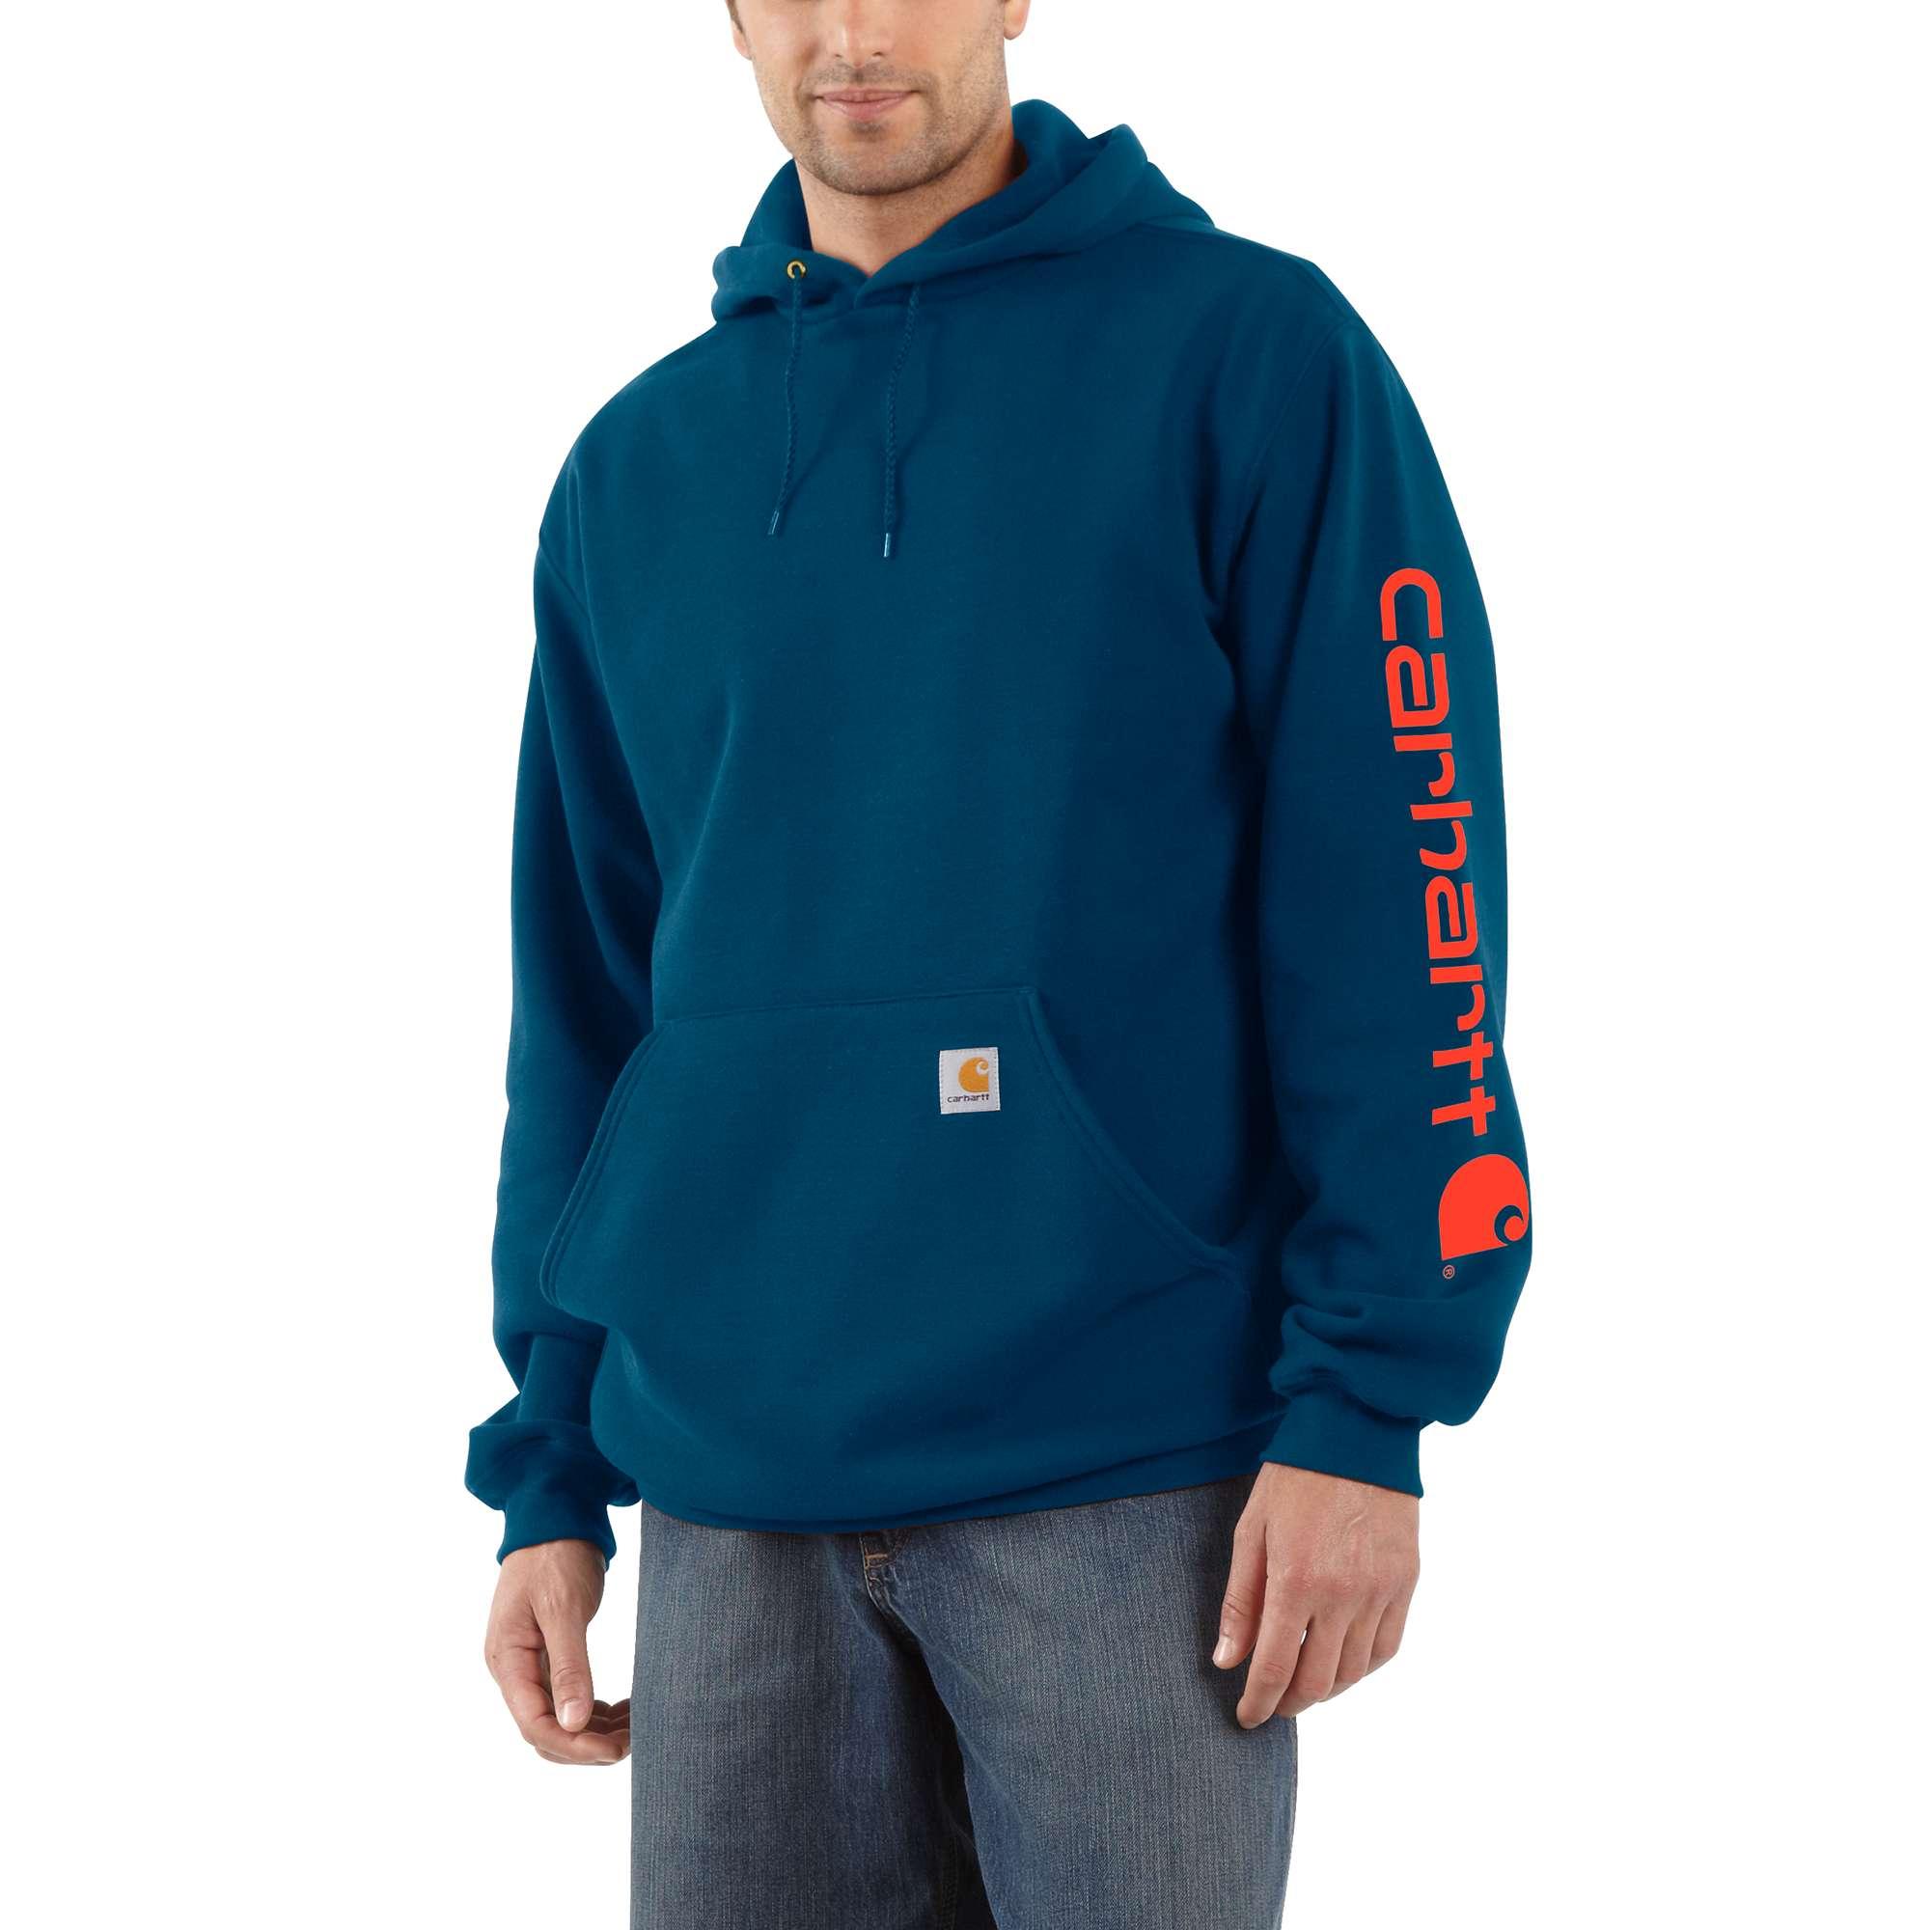 Men's Midweight Signature Logo Sleeve Hooded Sweatshirt, Blue, swatch